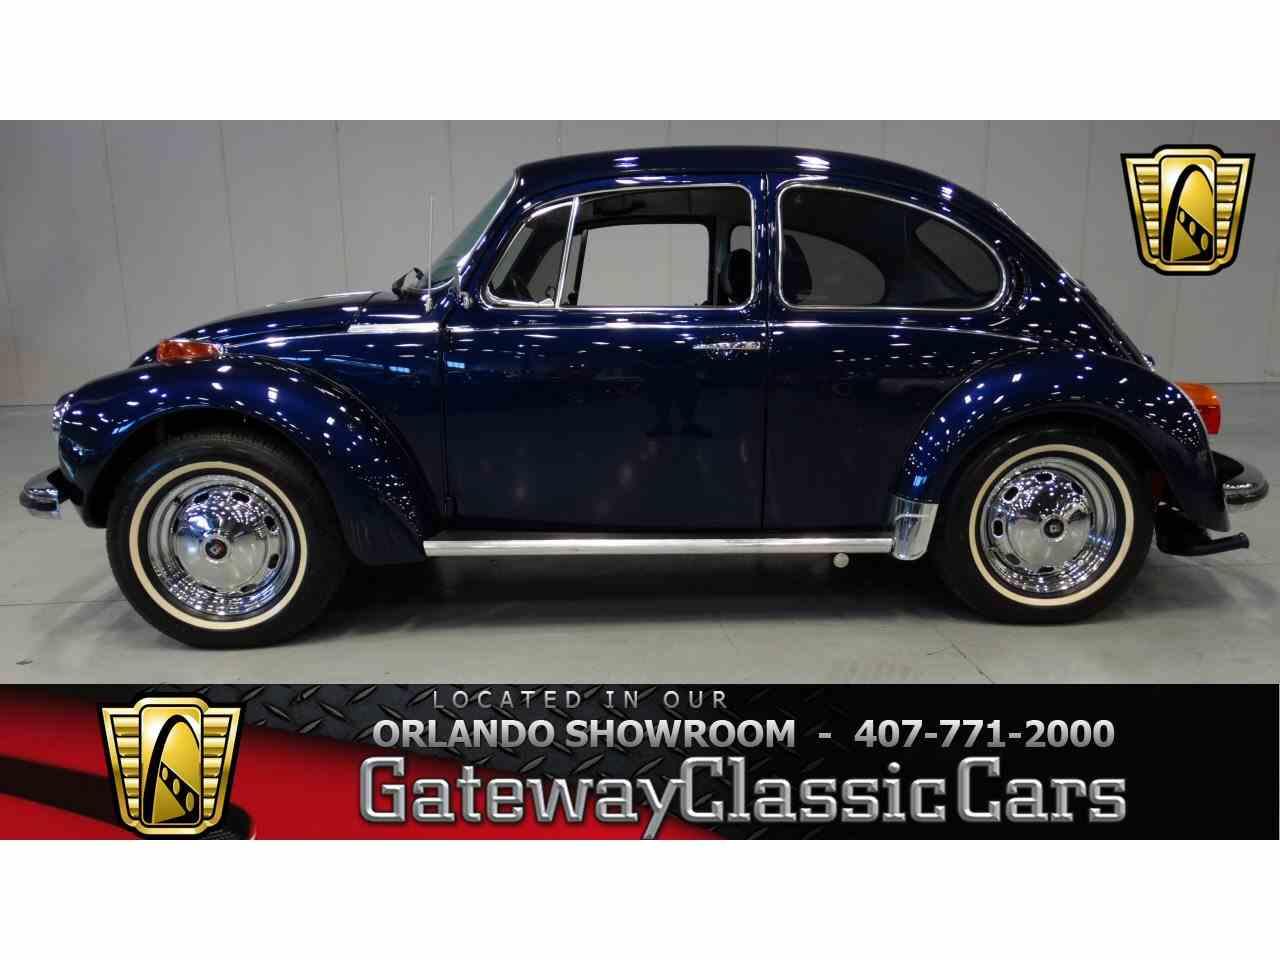 1973 Volkswagen Beetle For Sale Classiccars Com Cc 950700